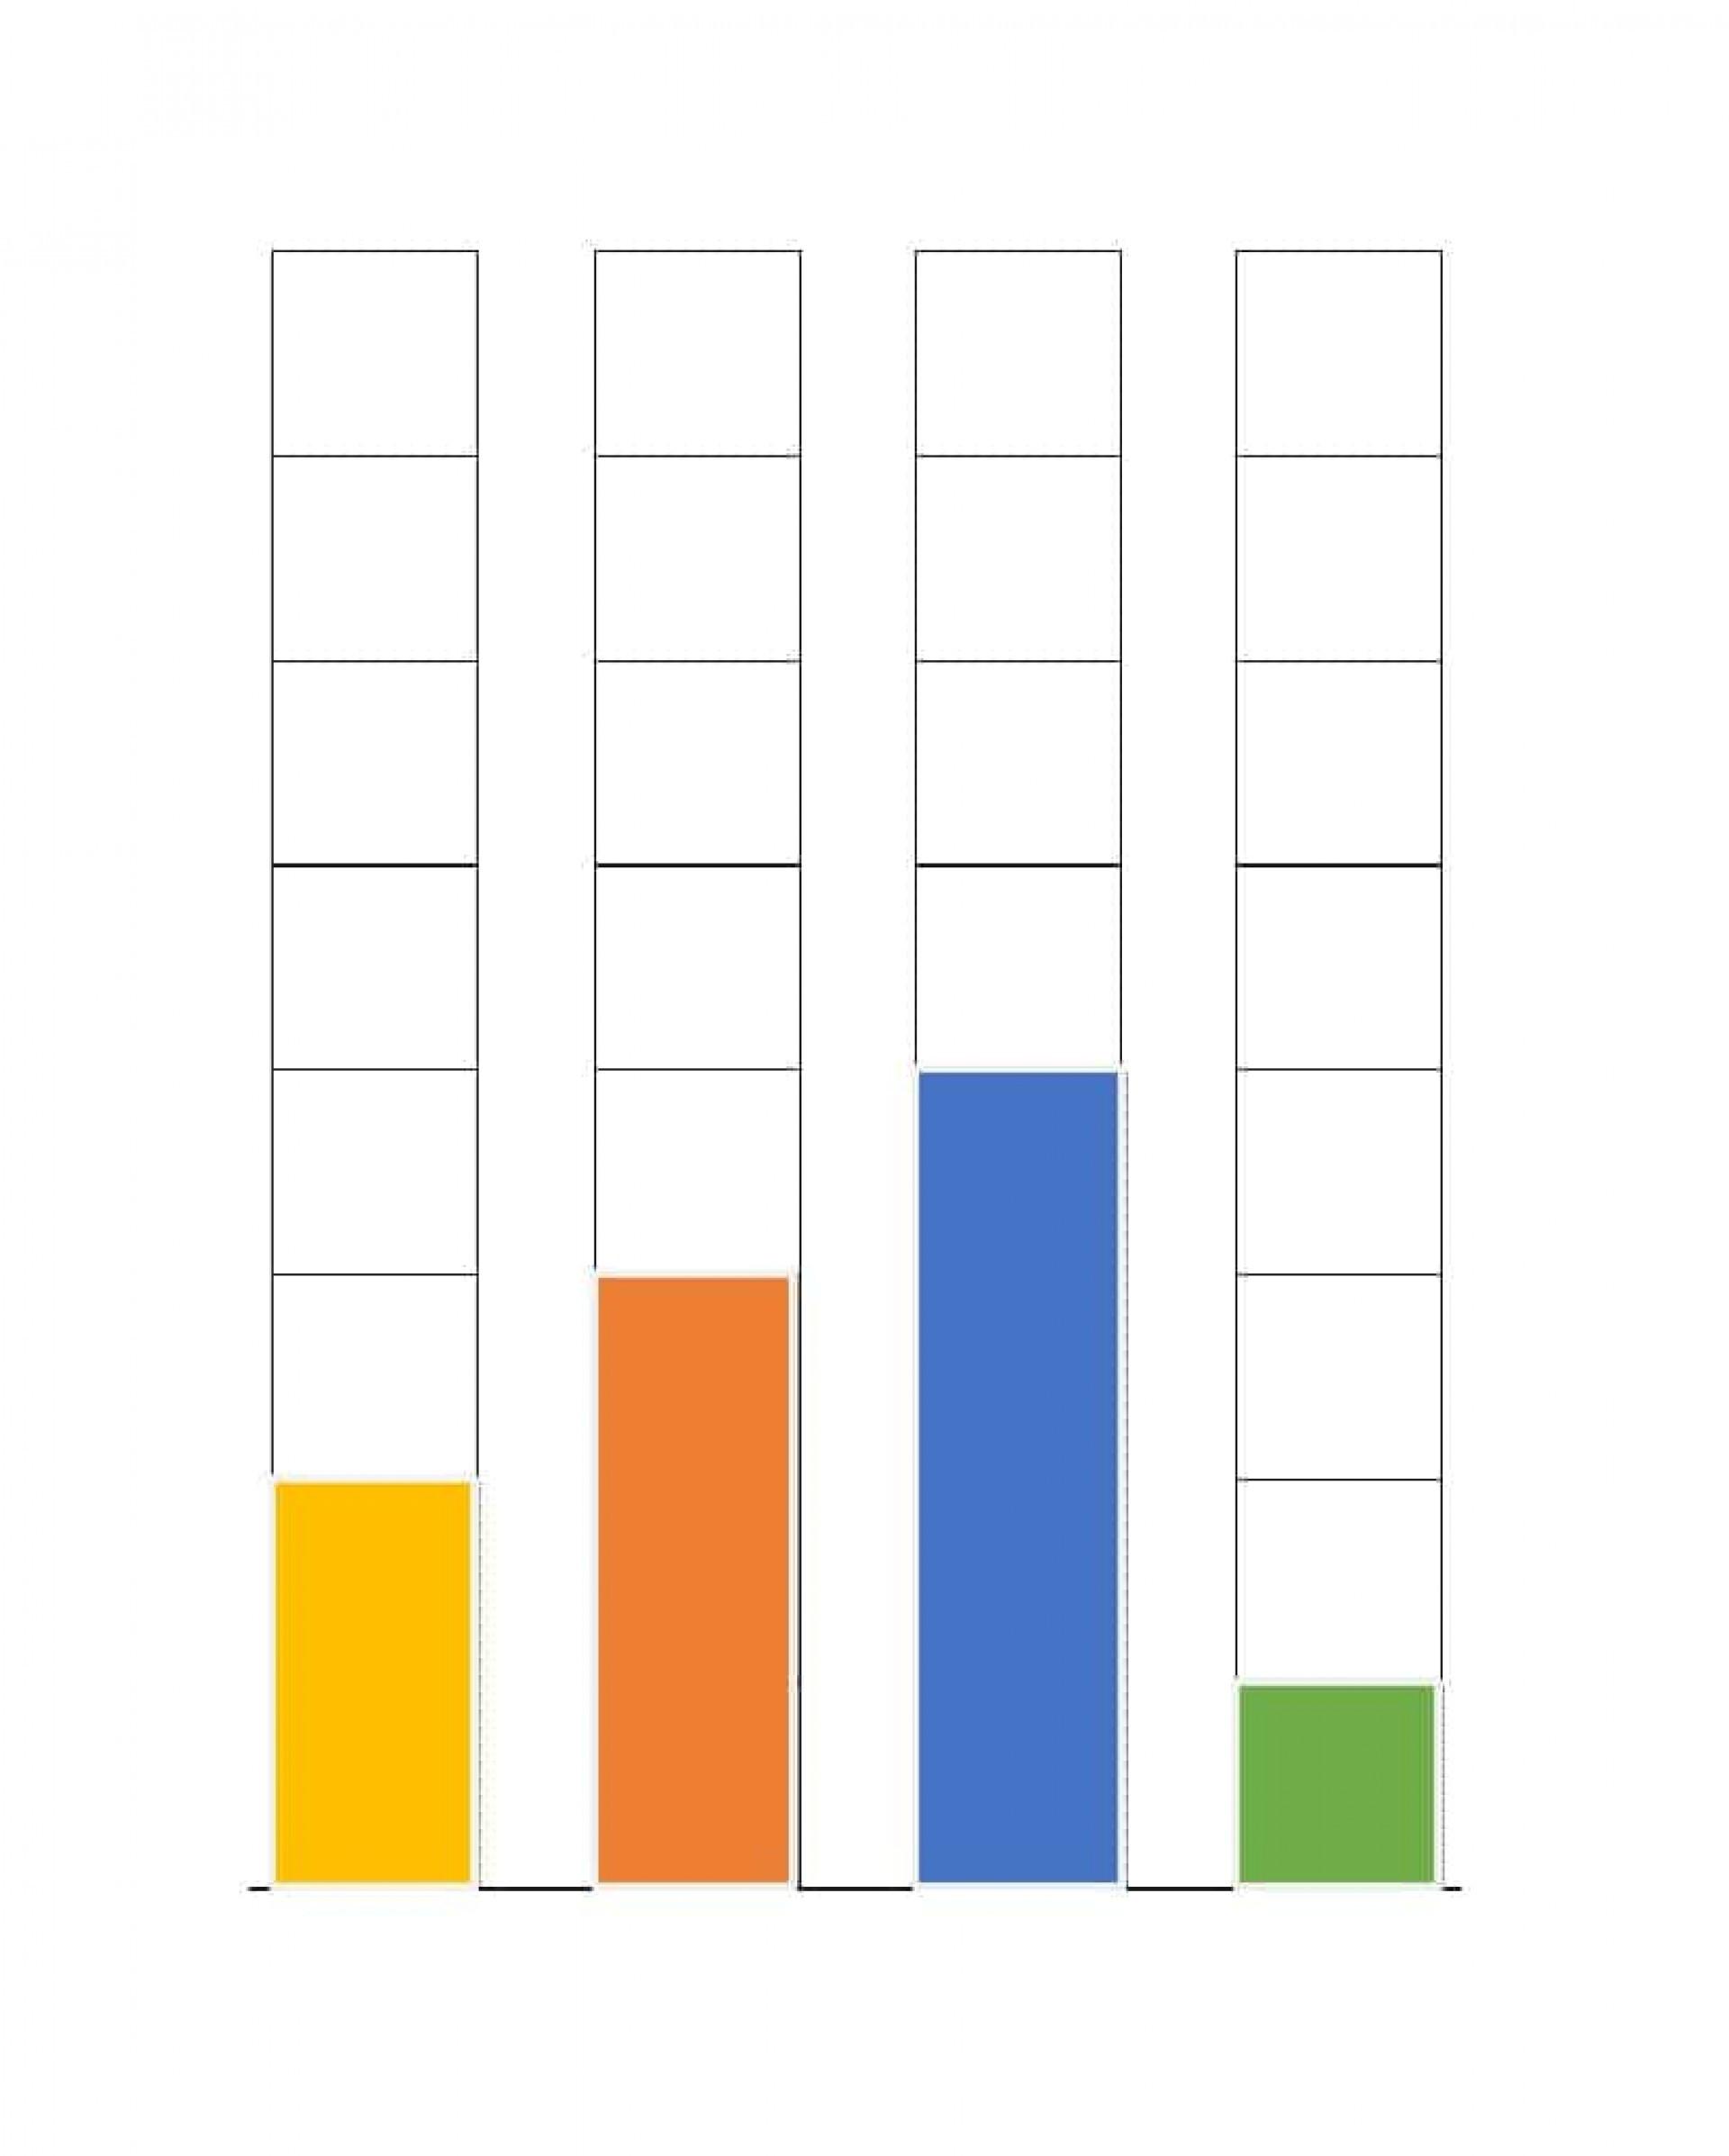 5 Spelling Worksheets First Grade 1 Spelling Words